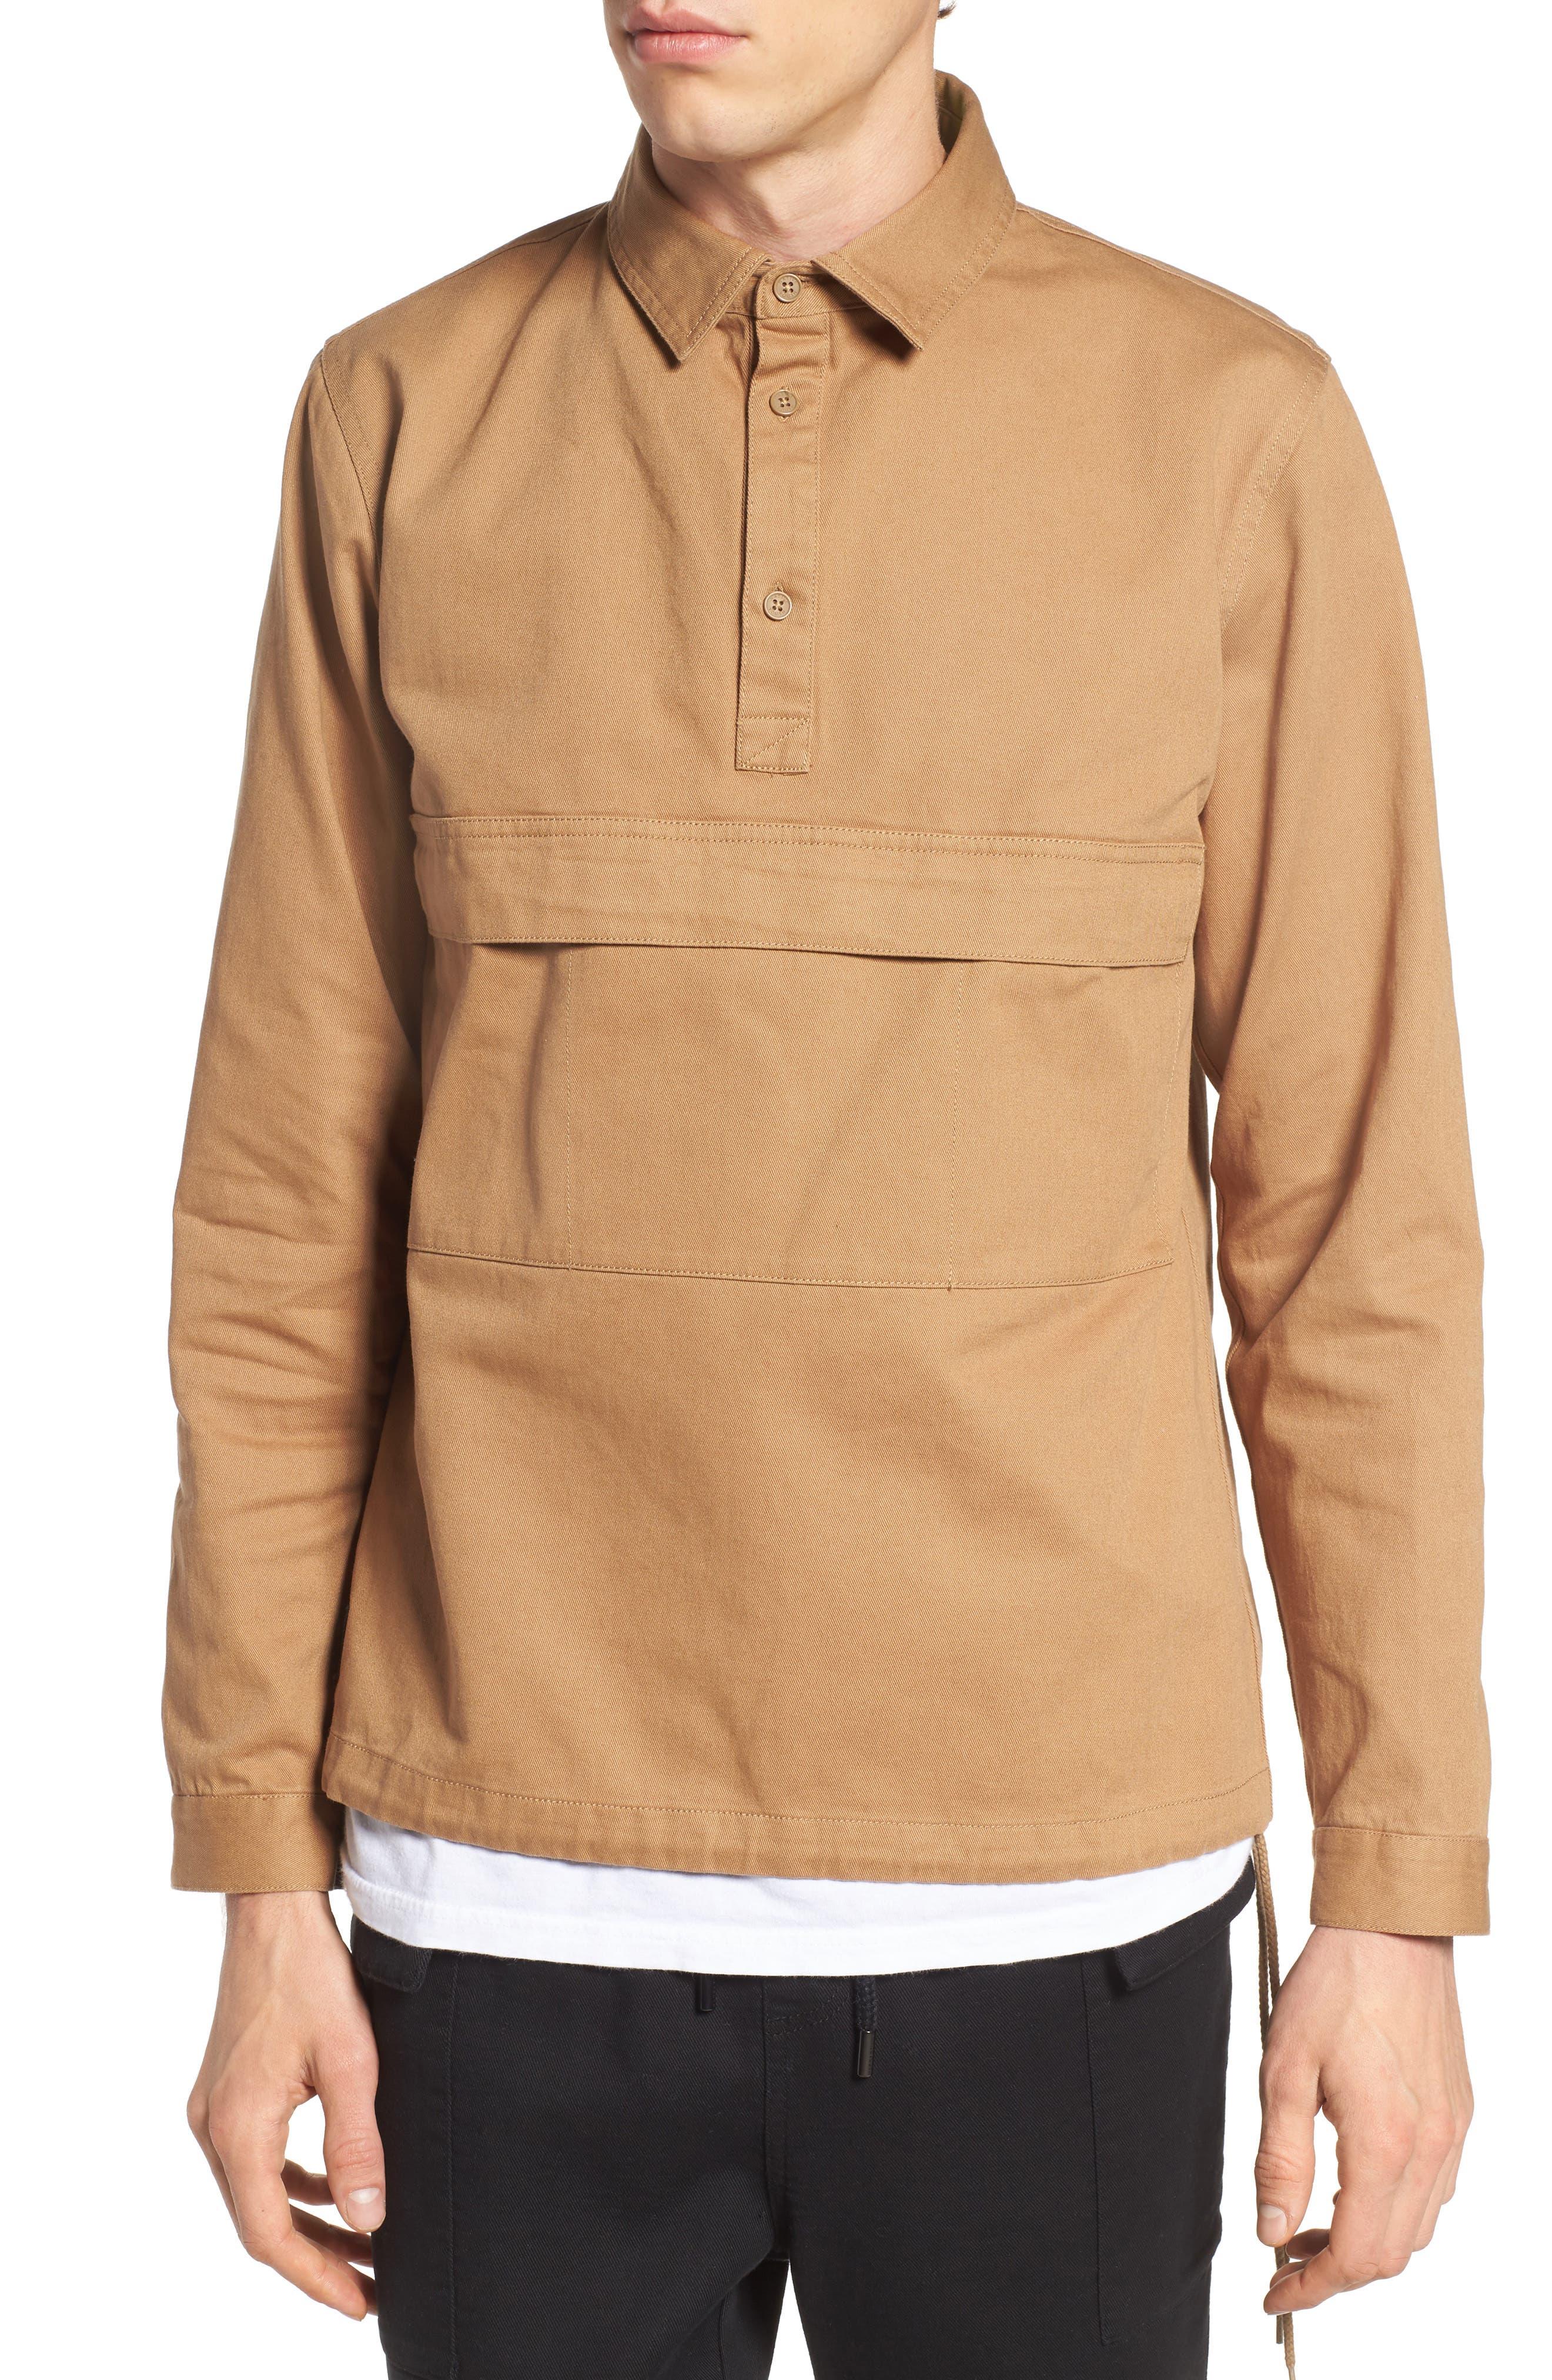 Woodside Twill Shirt,                         Main,                         color, 250